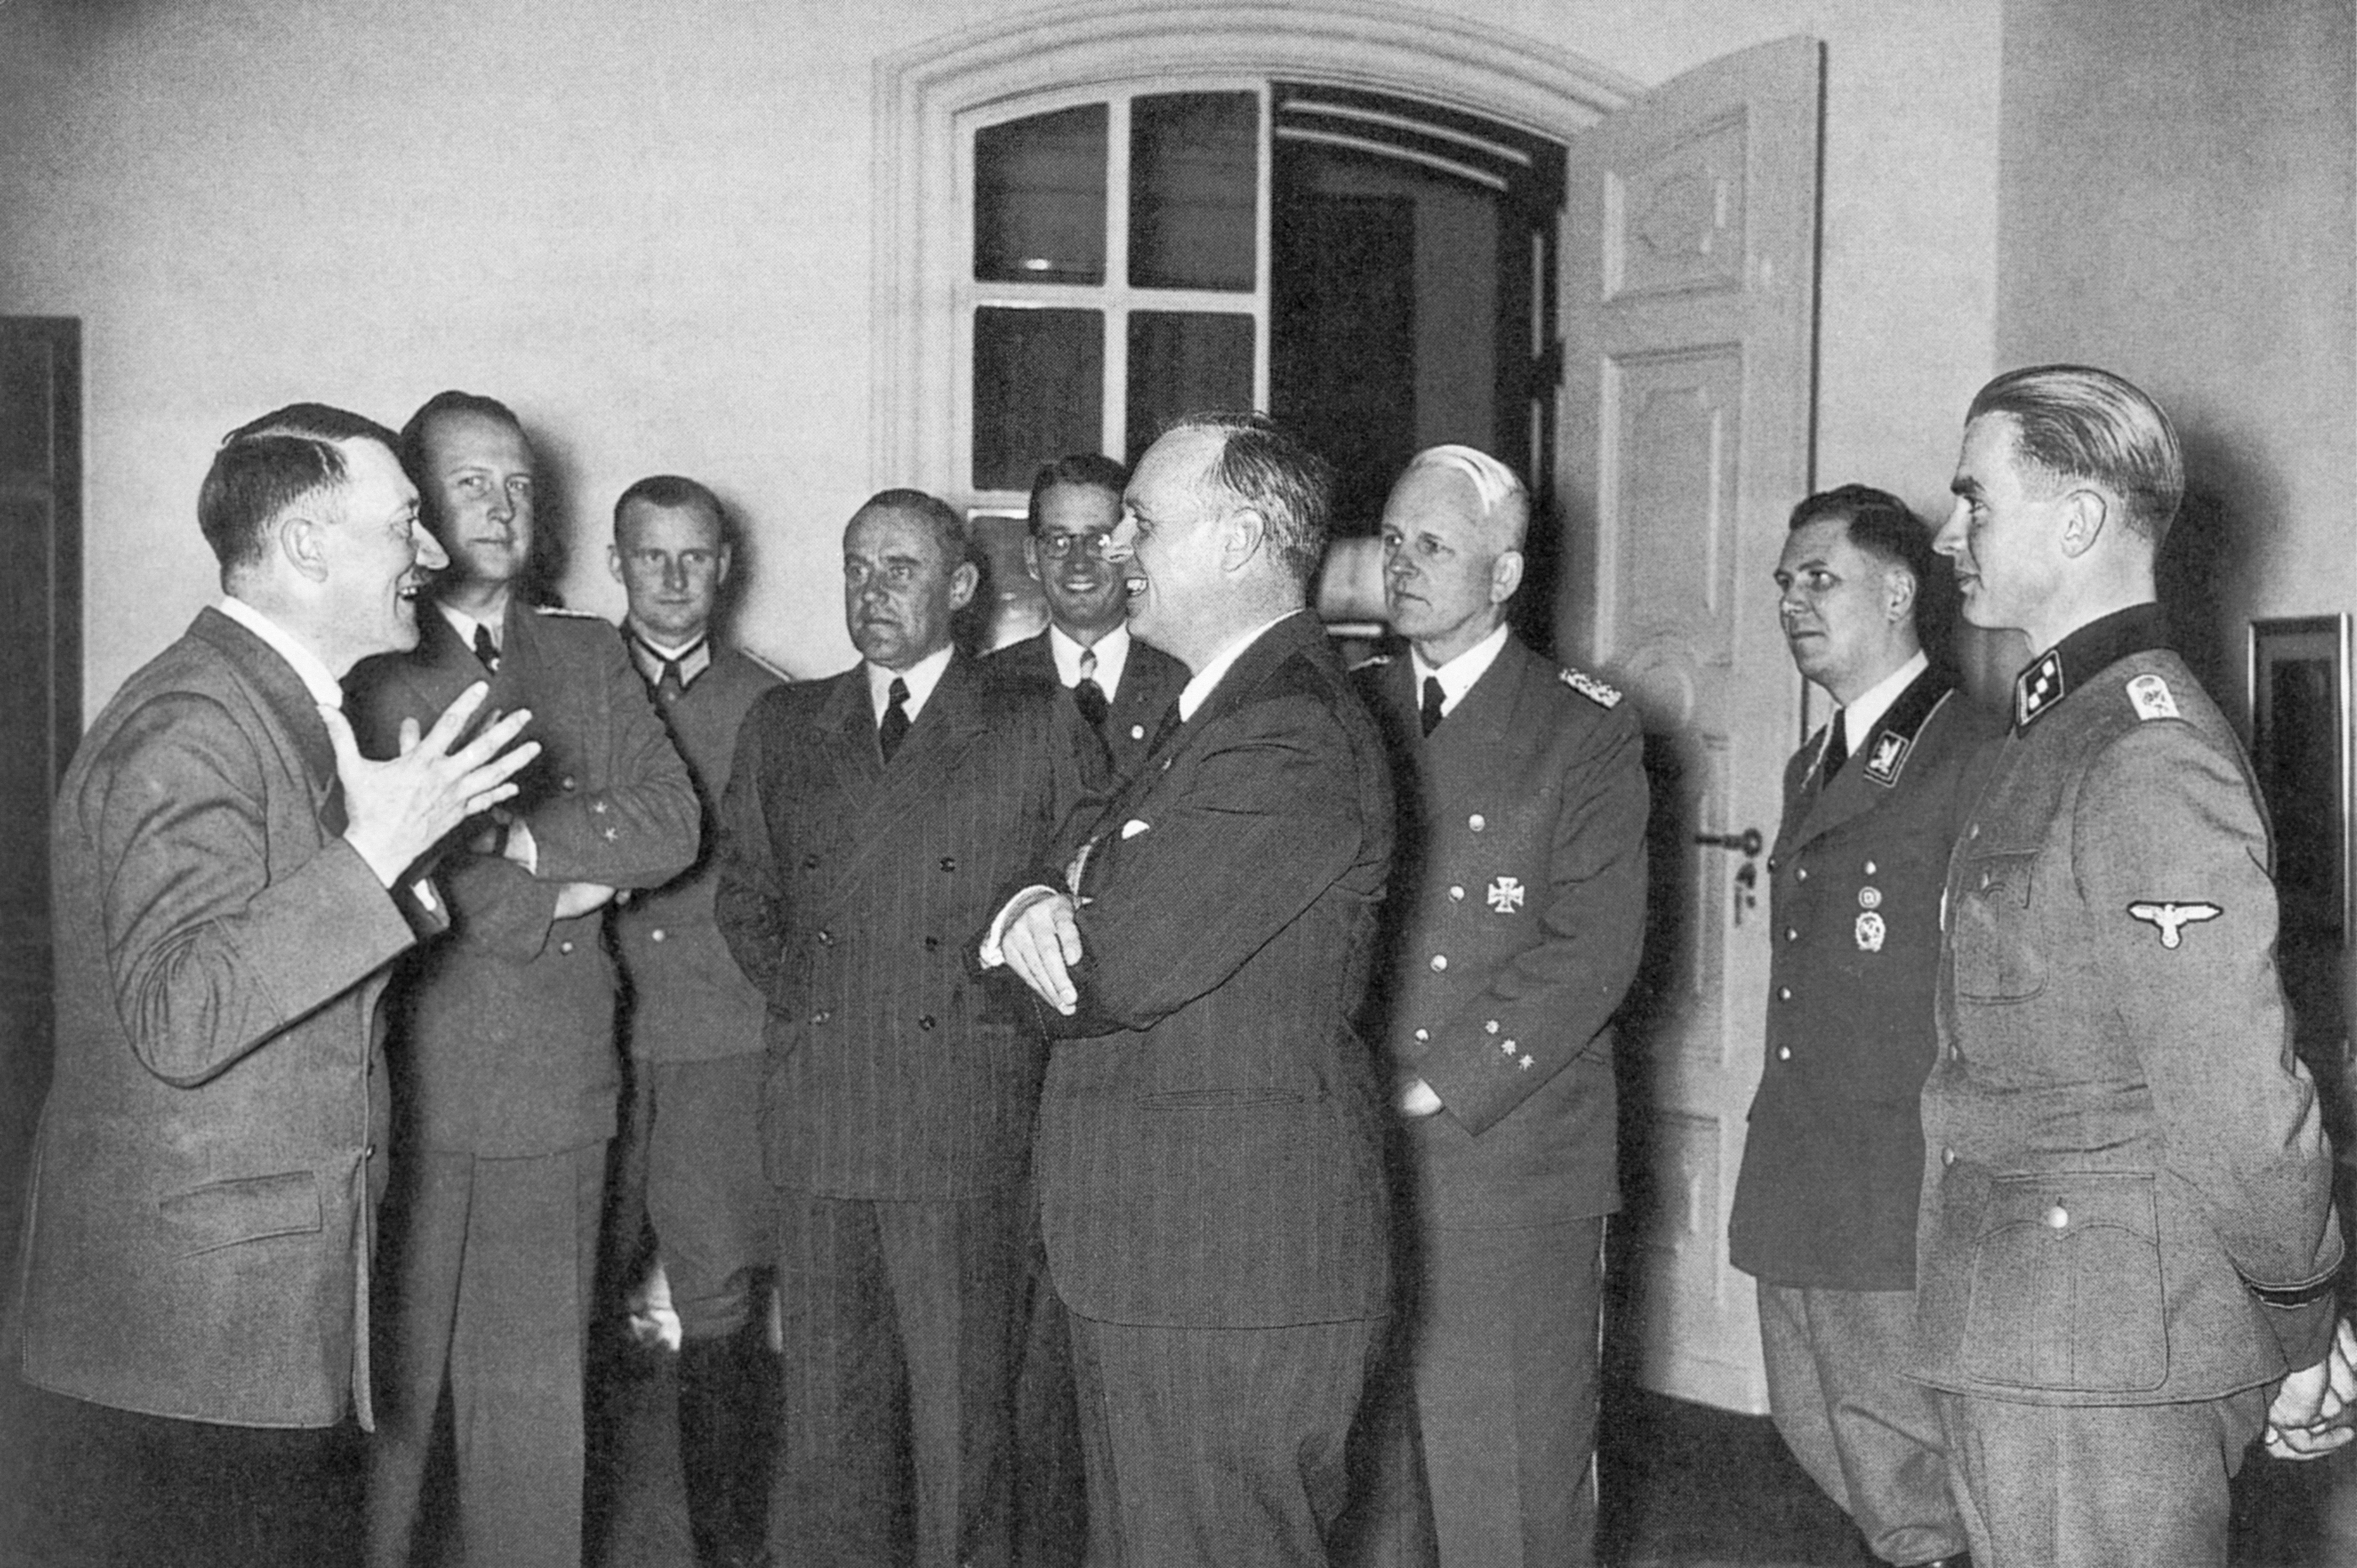 Фюрер Адольф Гитлер и глава МИД Германии Иоахим фон Риббентроп